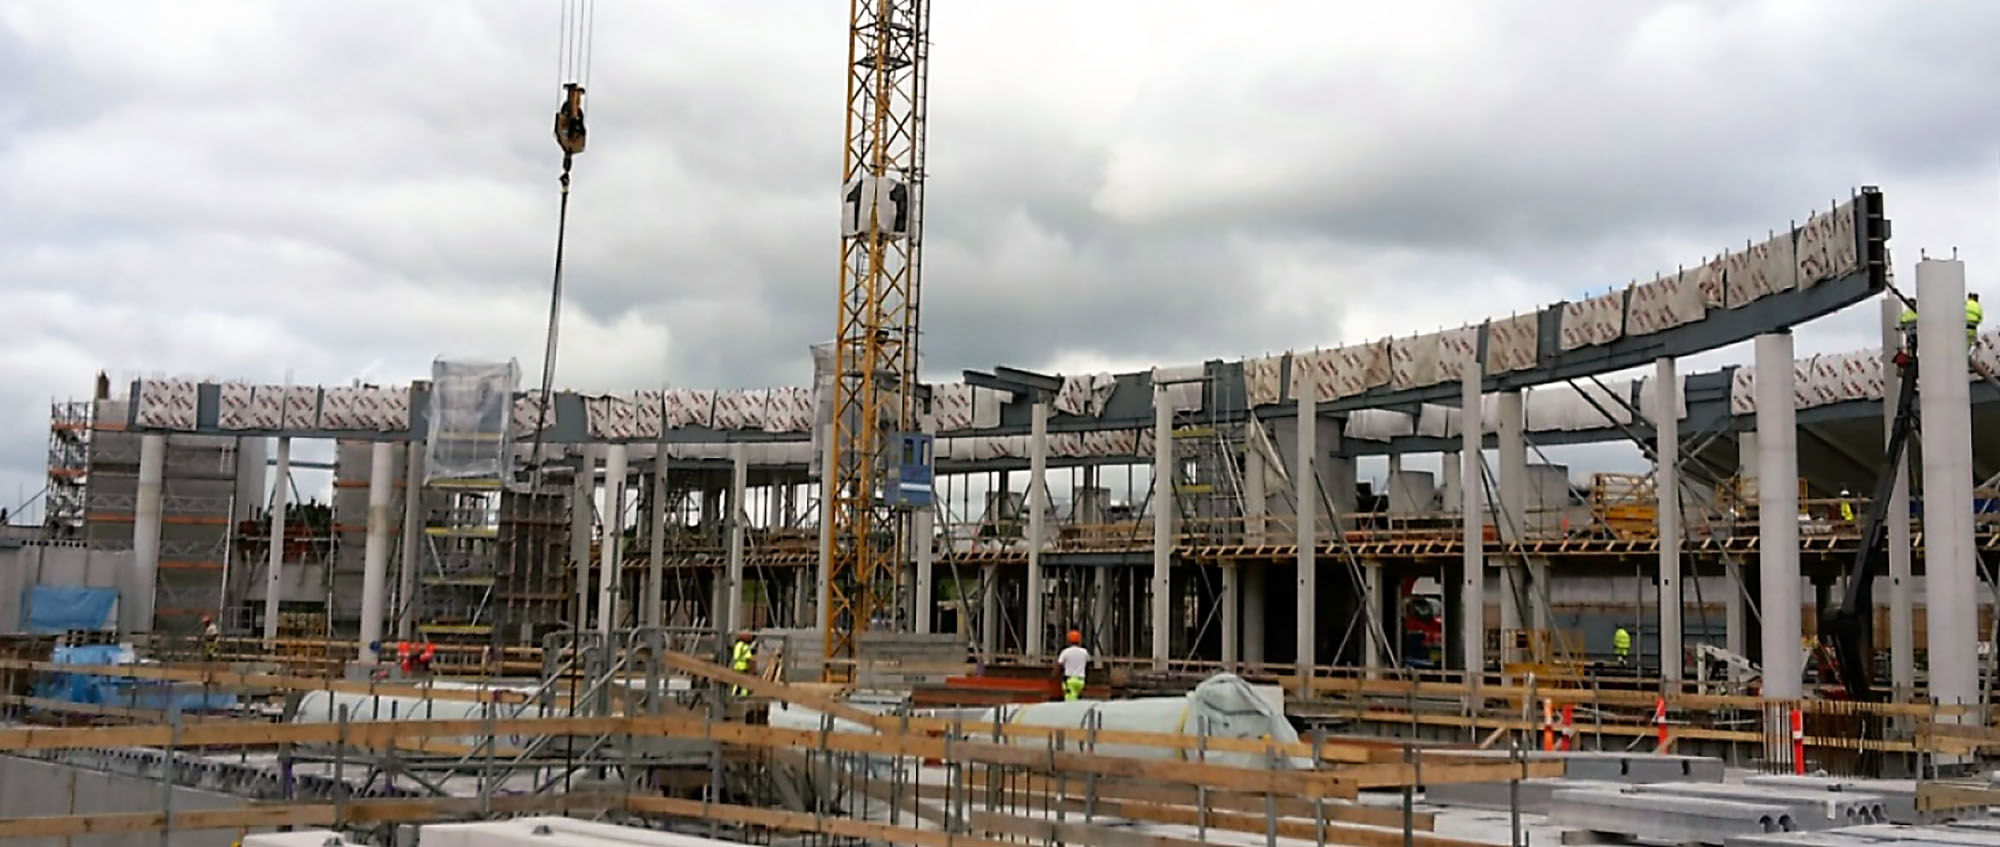 Steel Fabrication – NRS BRIDGE CONSTRUCTION EQUIPMENT